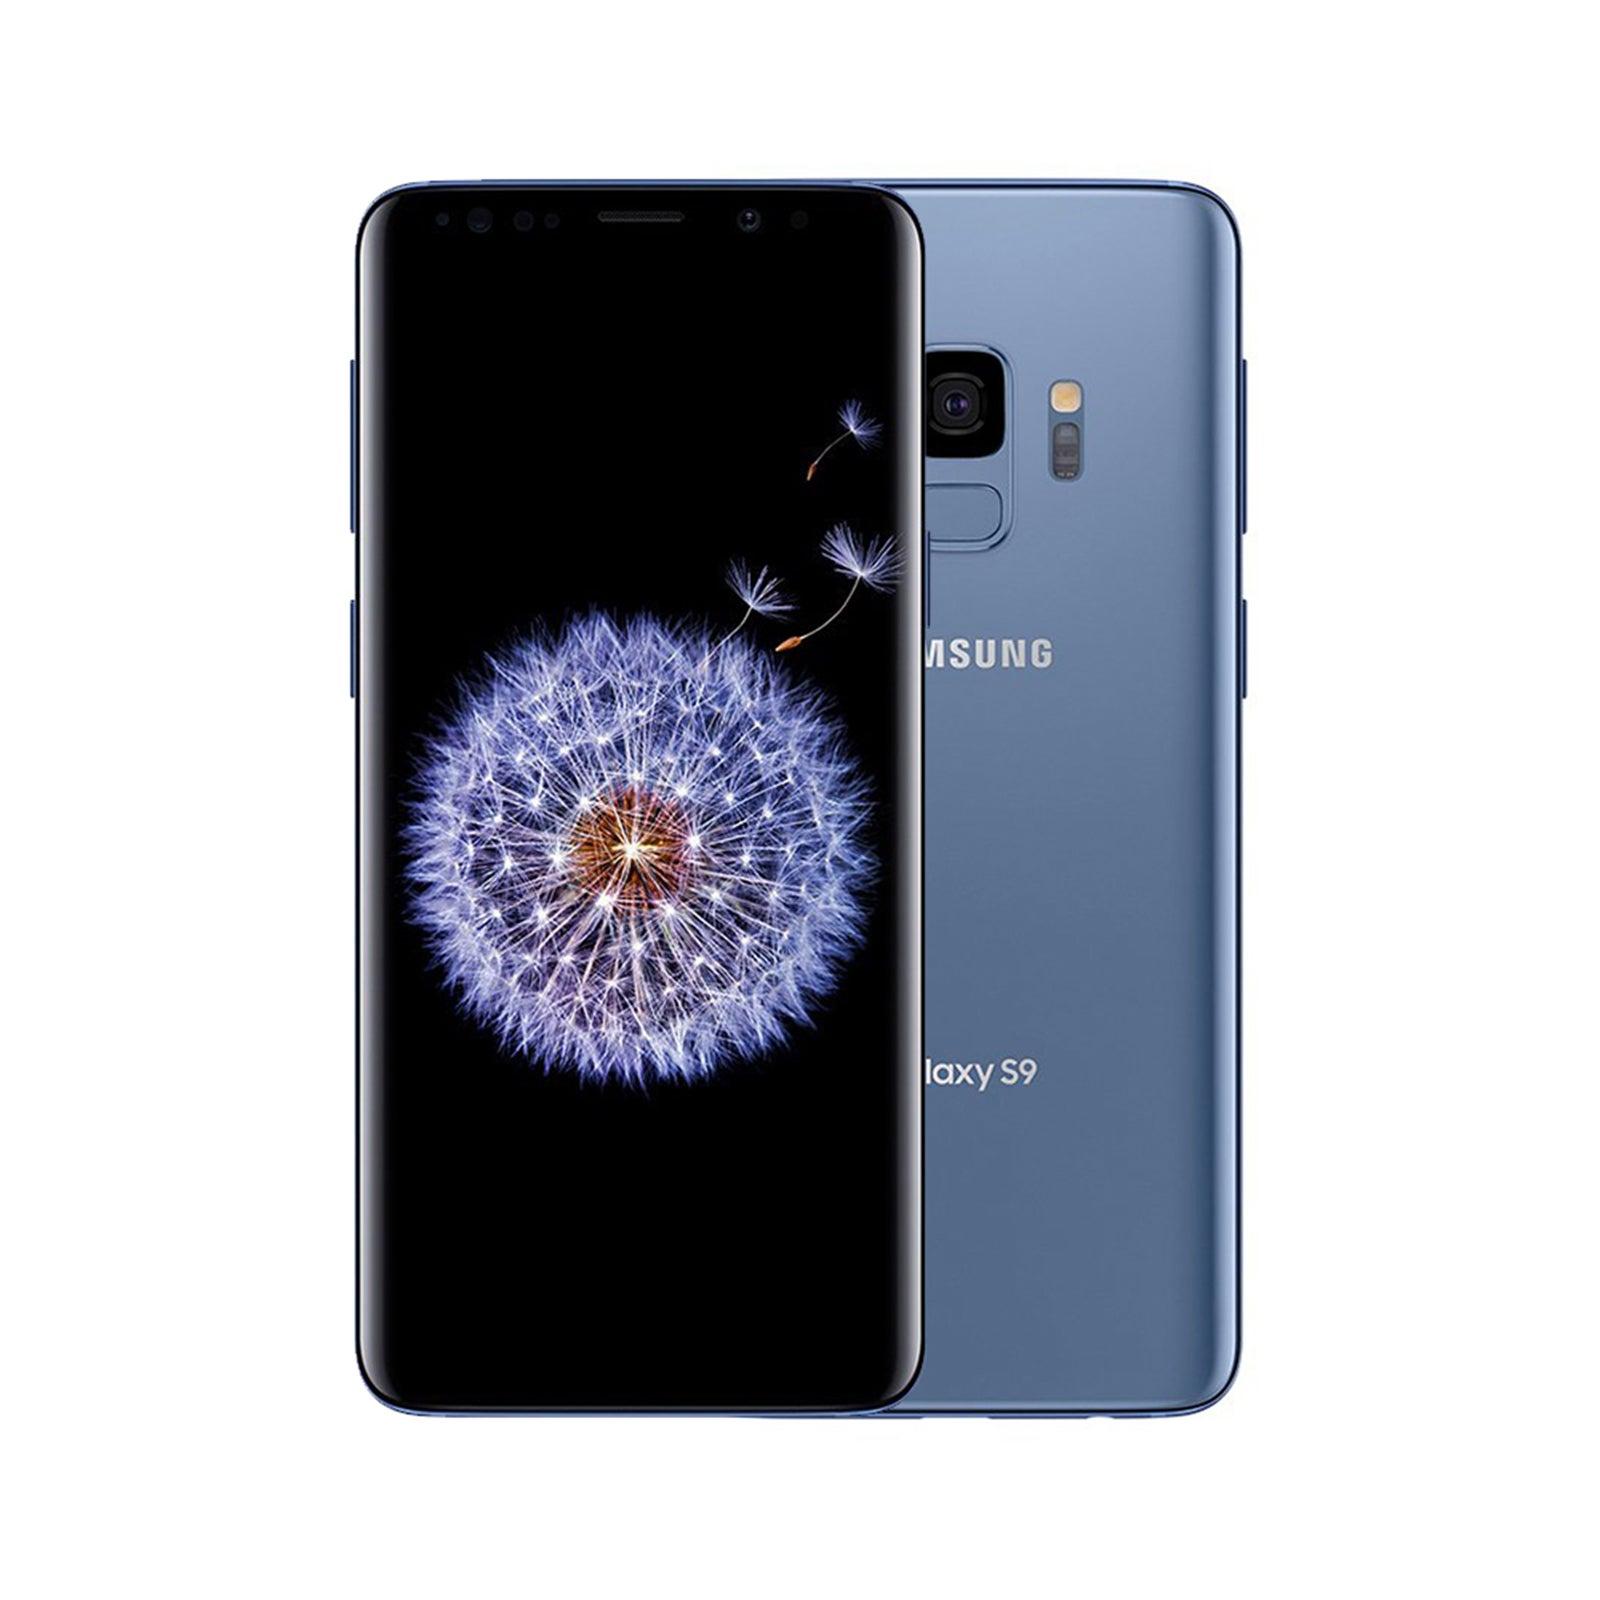 Samsung Galaxy S9 64GB Coral Blue - Refurbished (Good)